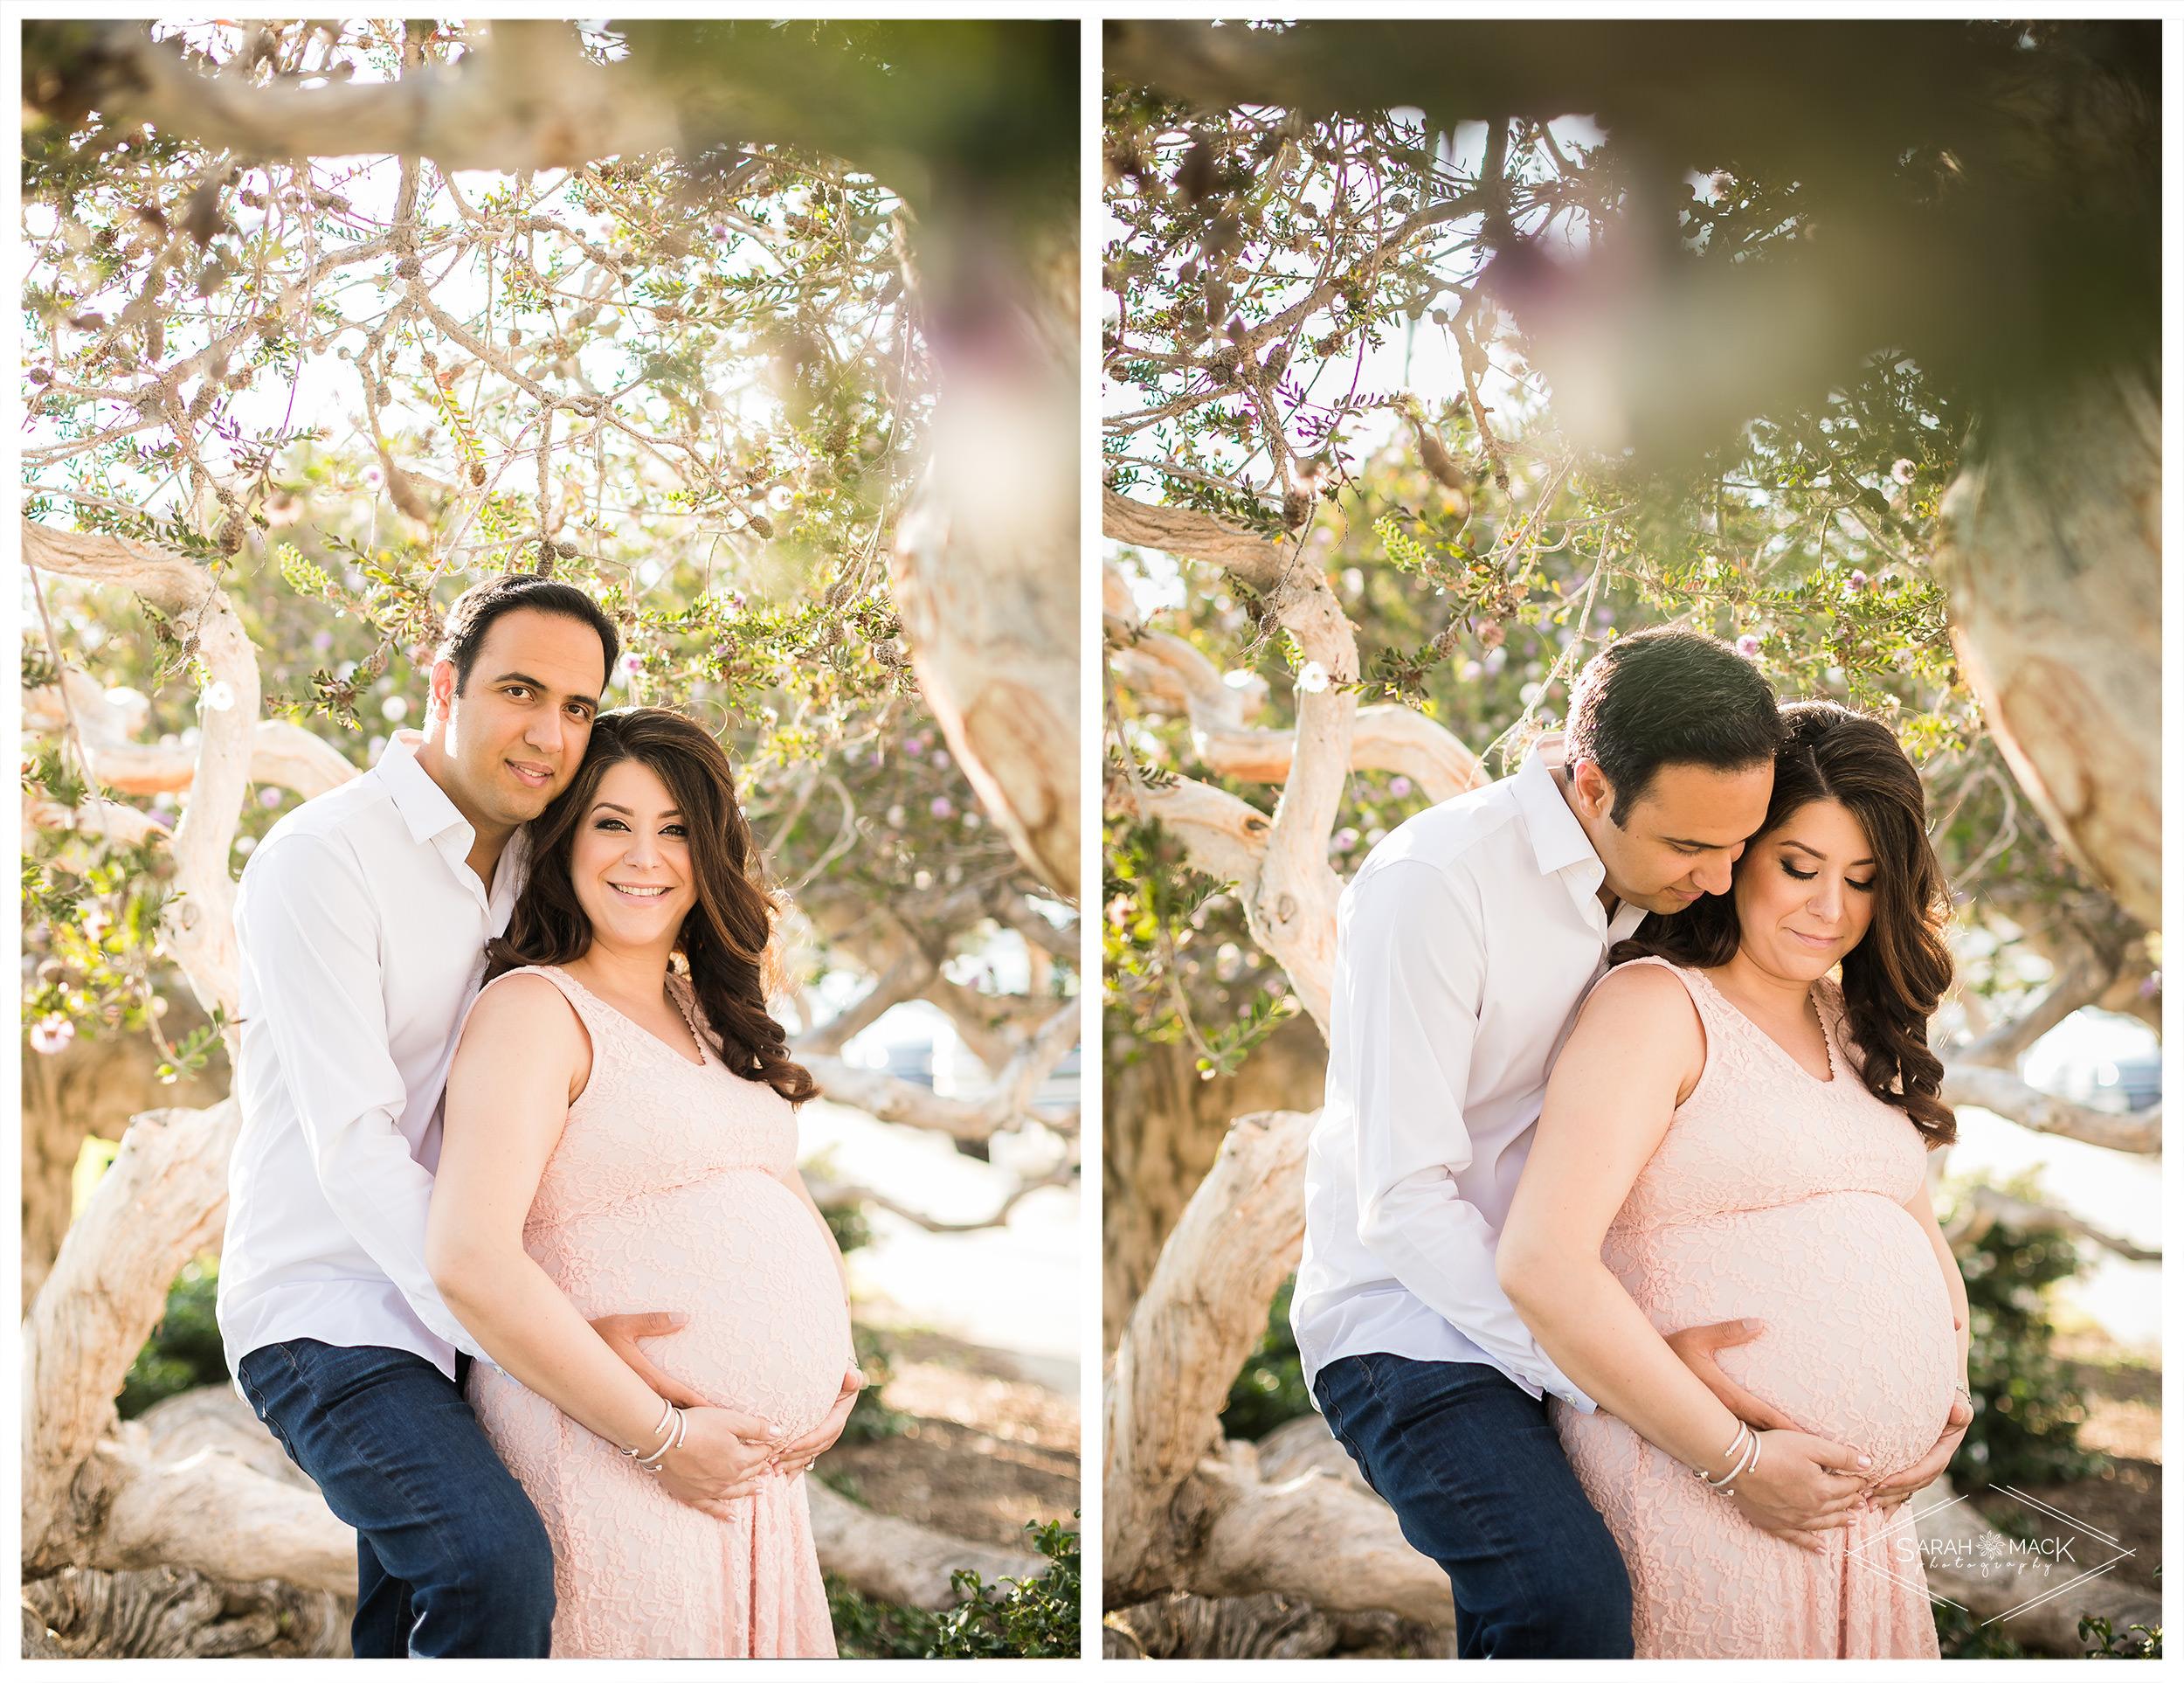 MA-Orange-County-Maternity-Photography-1.jpg